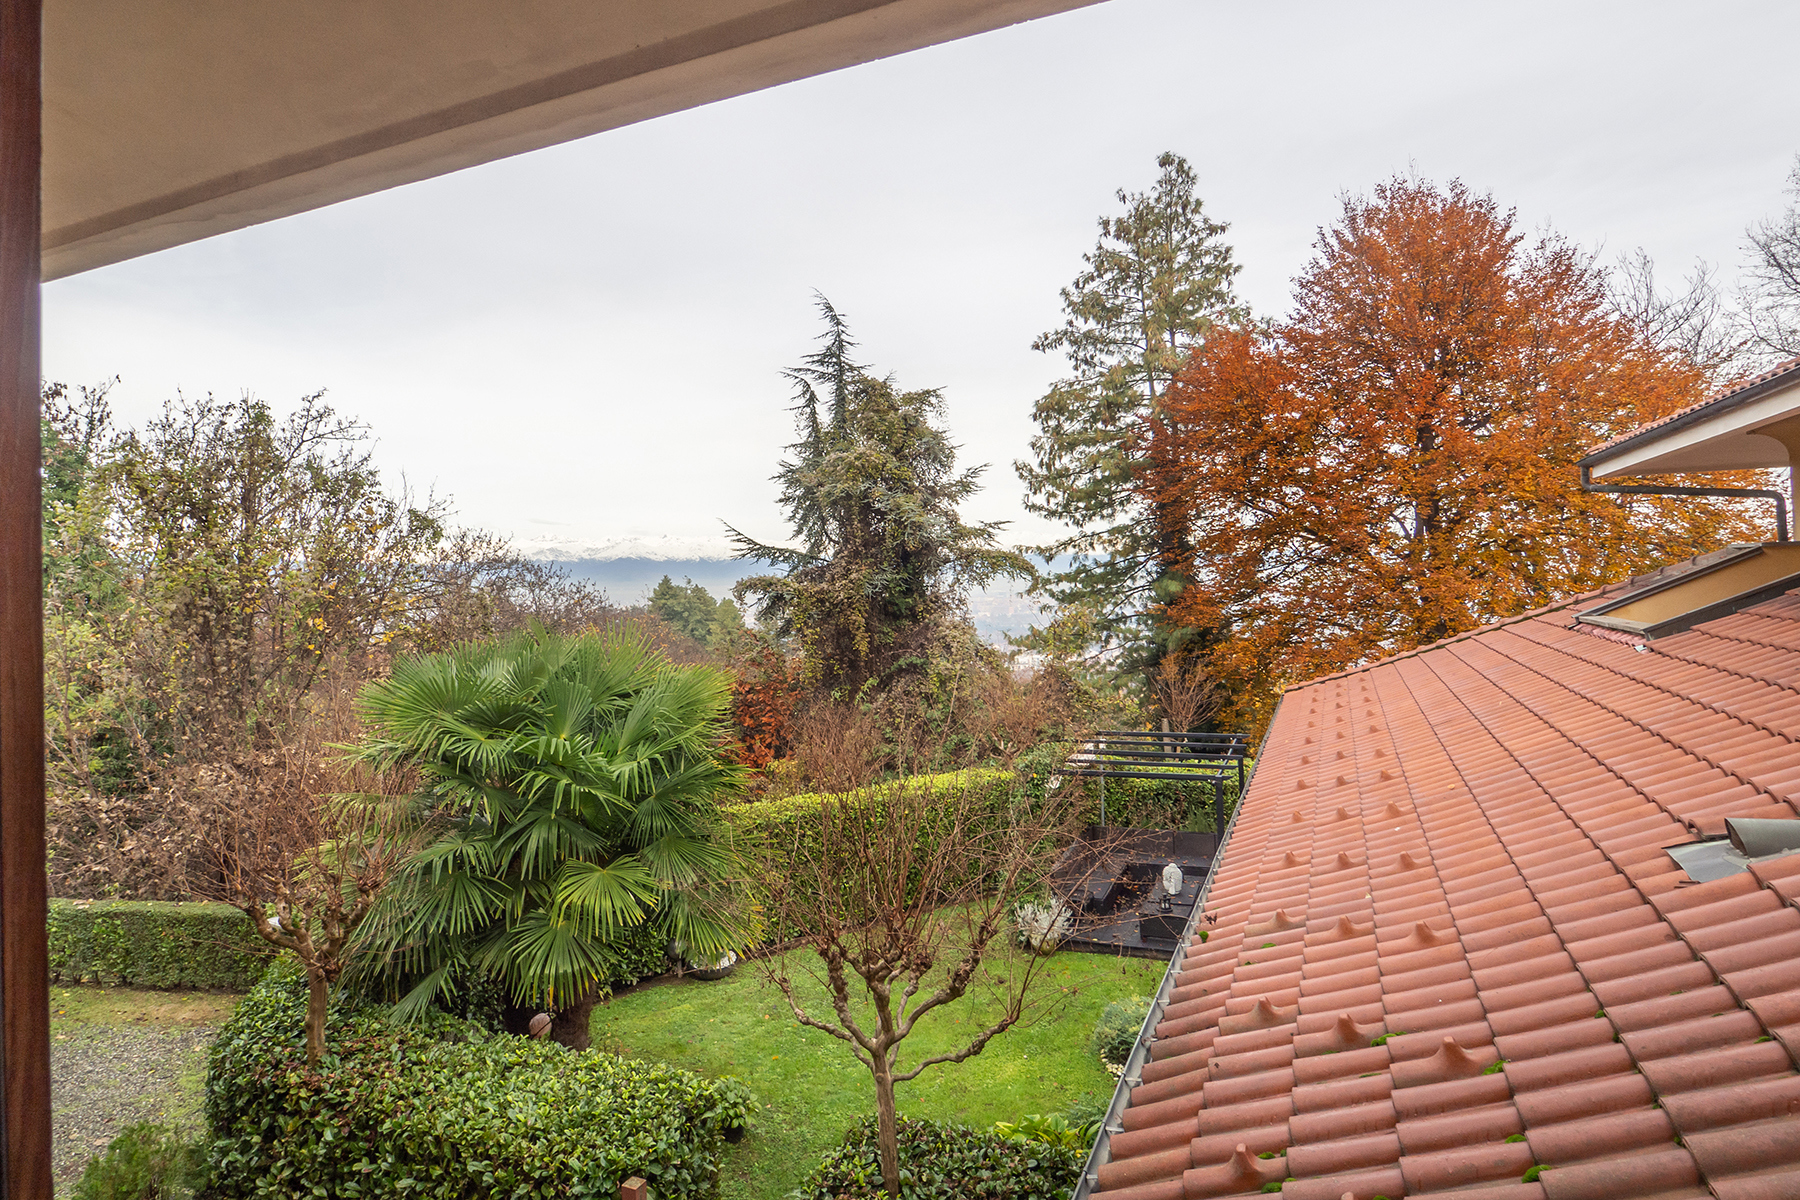 Casa indipendente in Vendita a Torino: 5 locali, 277 mq - Foto 12